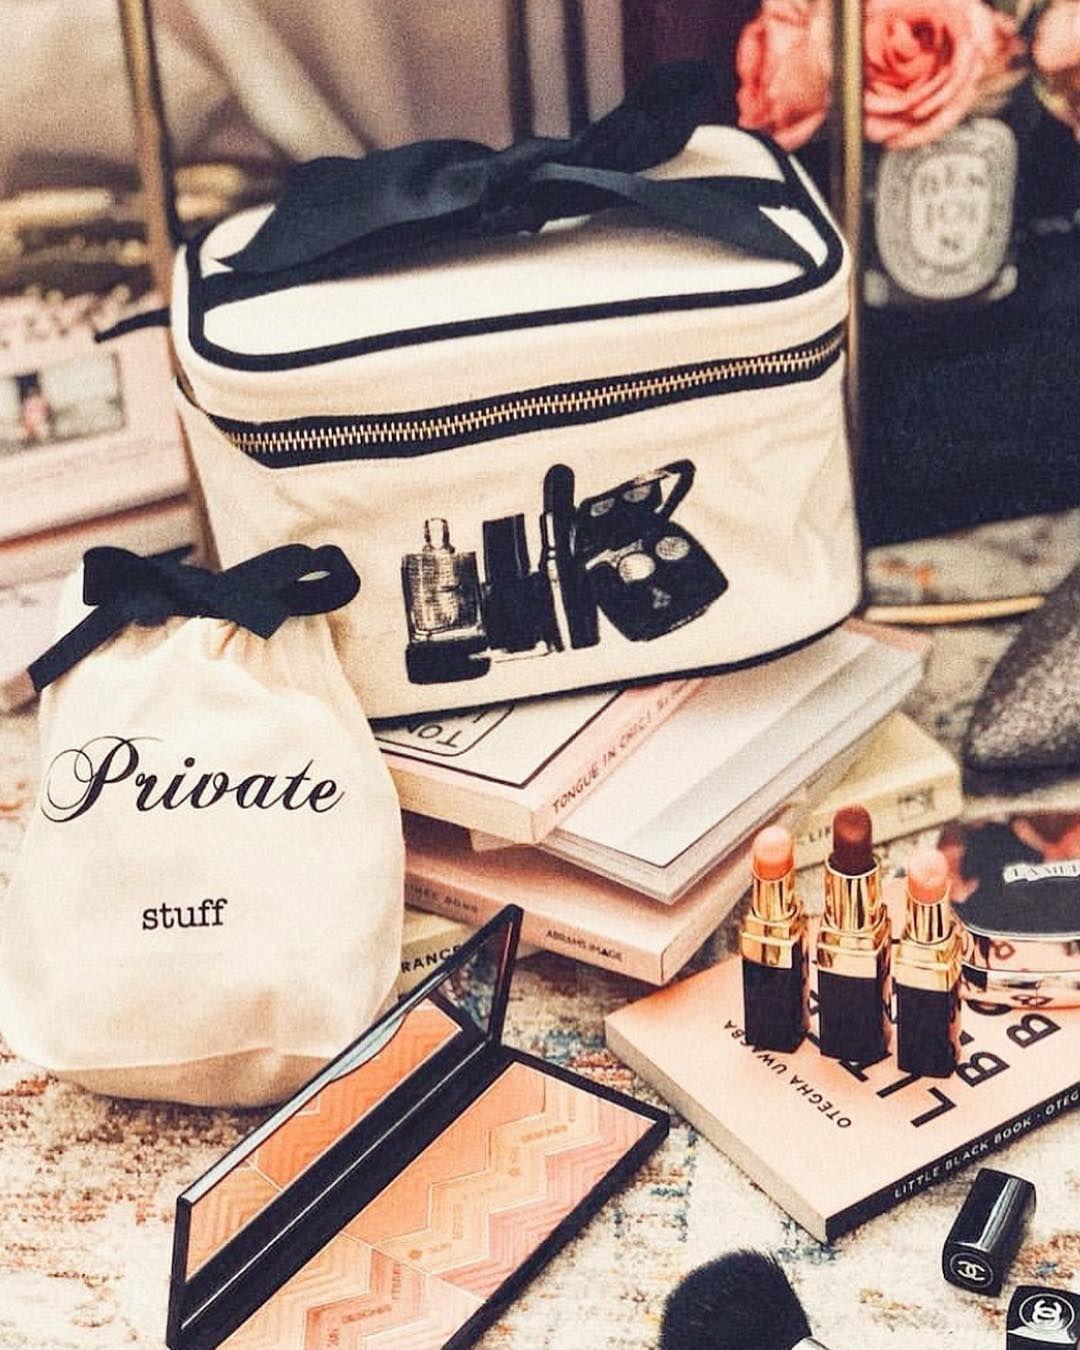 Pin on Makeup Organization Ideas  Bag, Case & Vanity